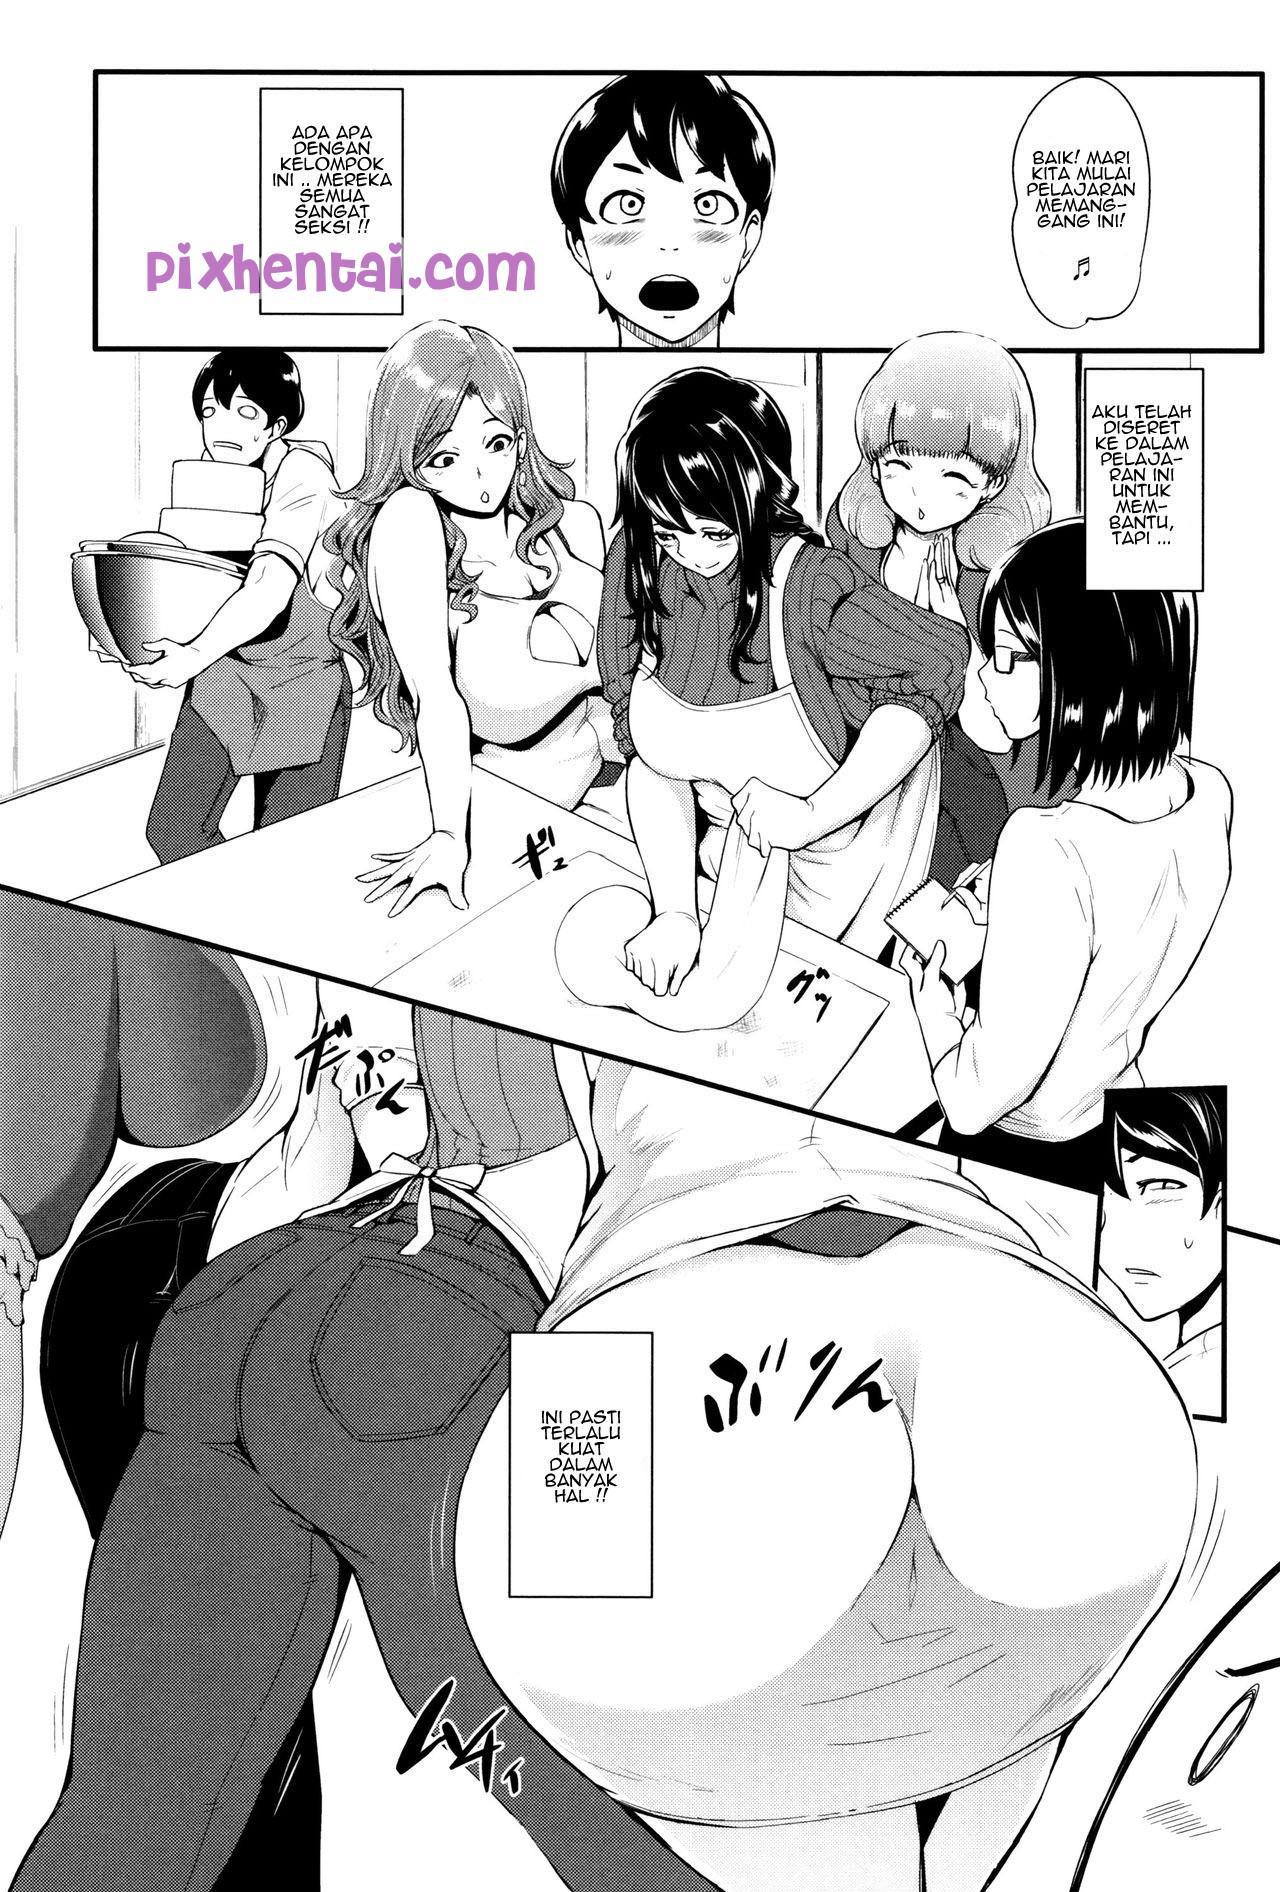 Komik hentai xxx manga sex bokep daya tarik seks teman-teman ibu 04